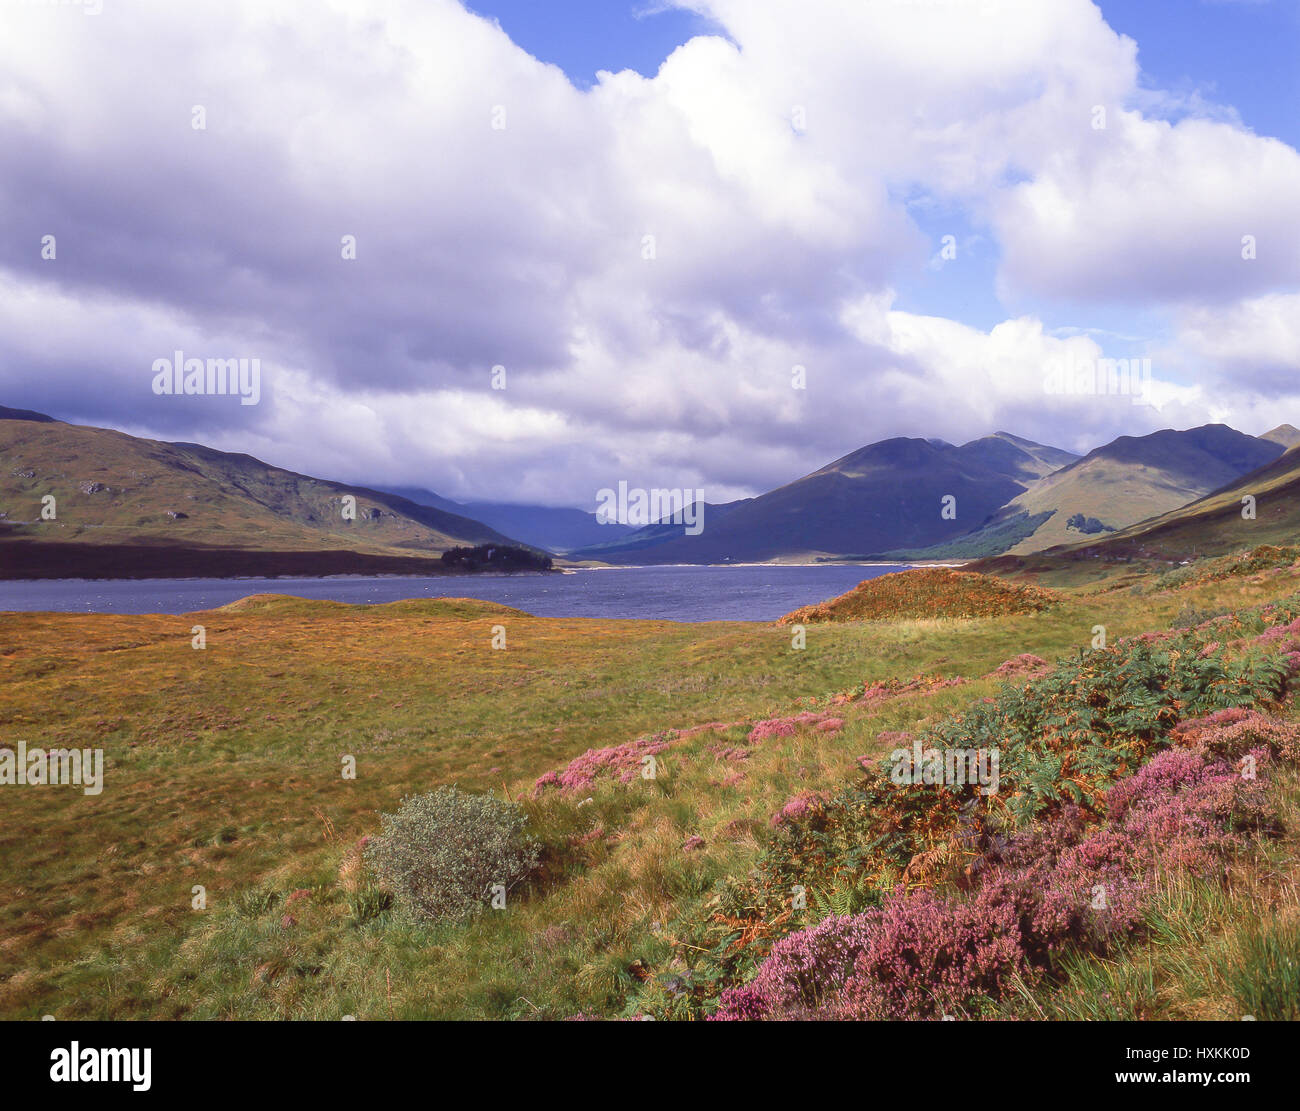 Loch Eilt, Lochaber District, Highland, Scotland, United Kingdom - Stock Image